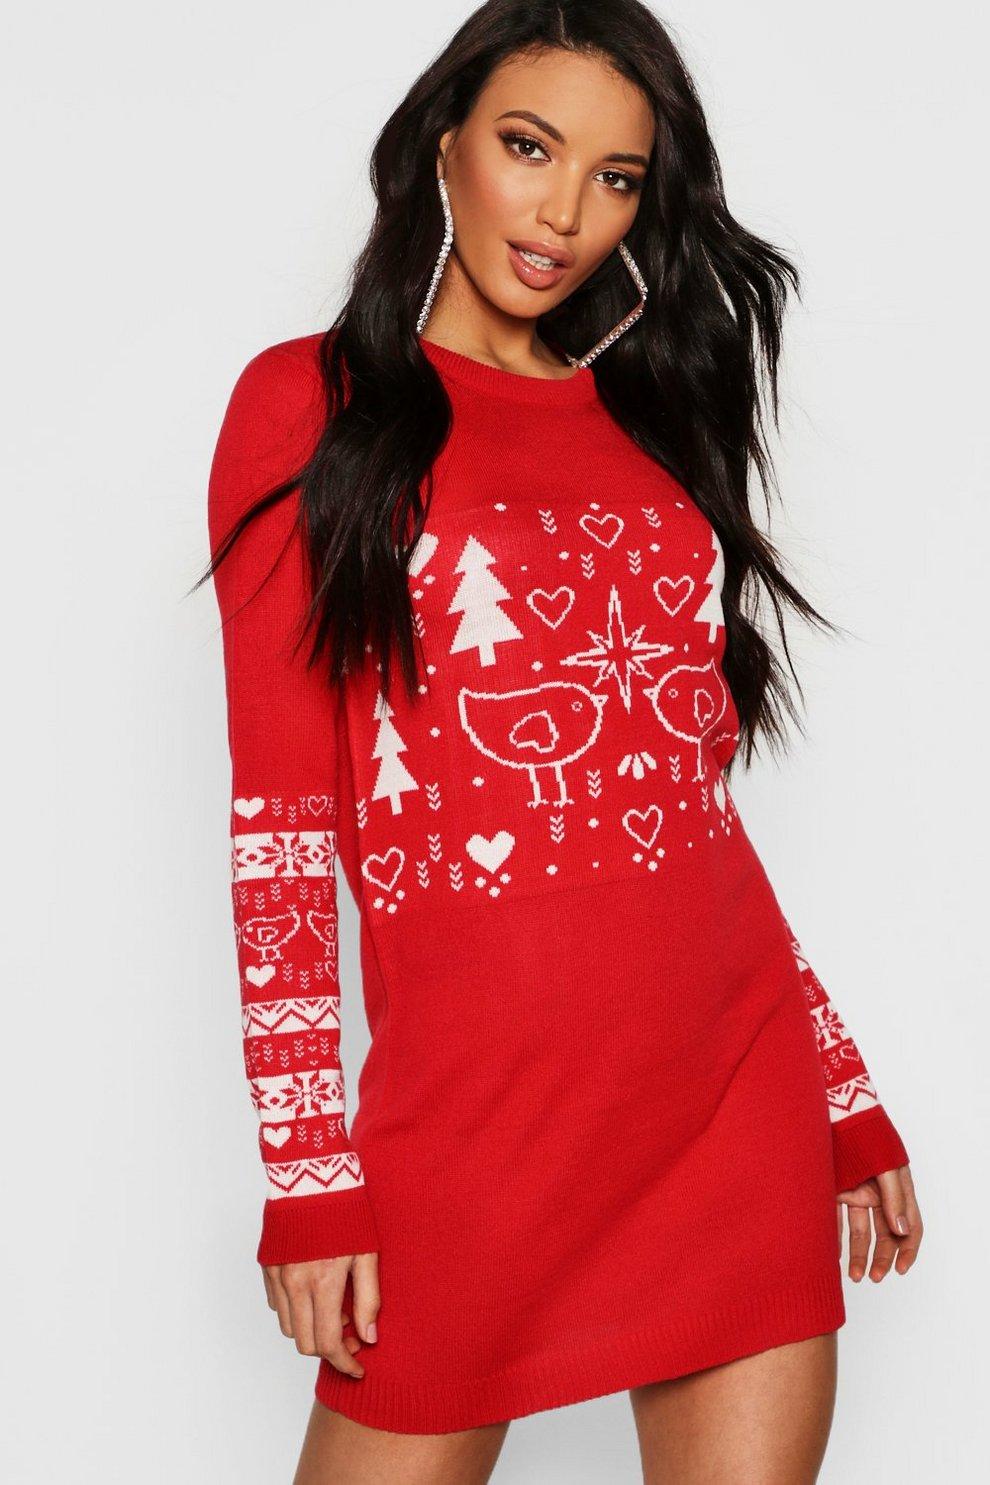 ecabfbff4a4 Womens Red Christmas Sweater Dress